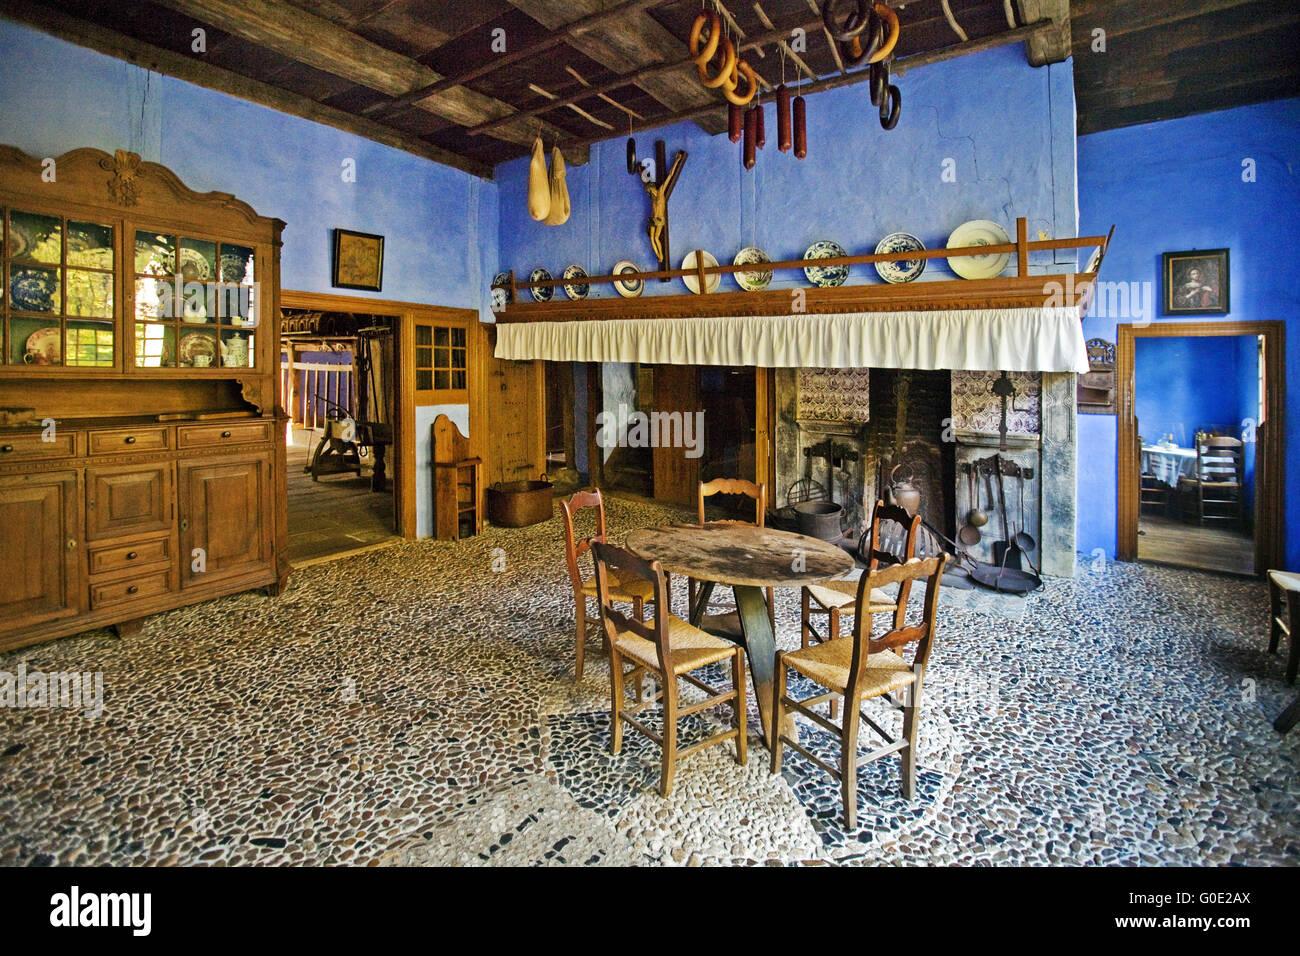 historic interior, open air museum, Detmold - Stock Image